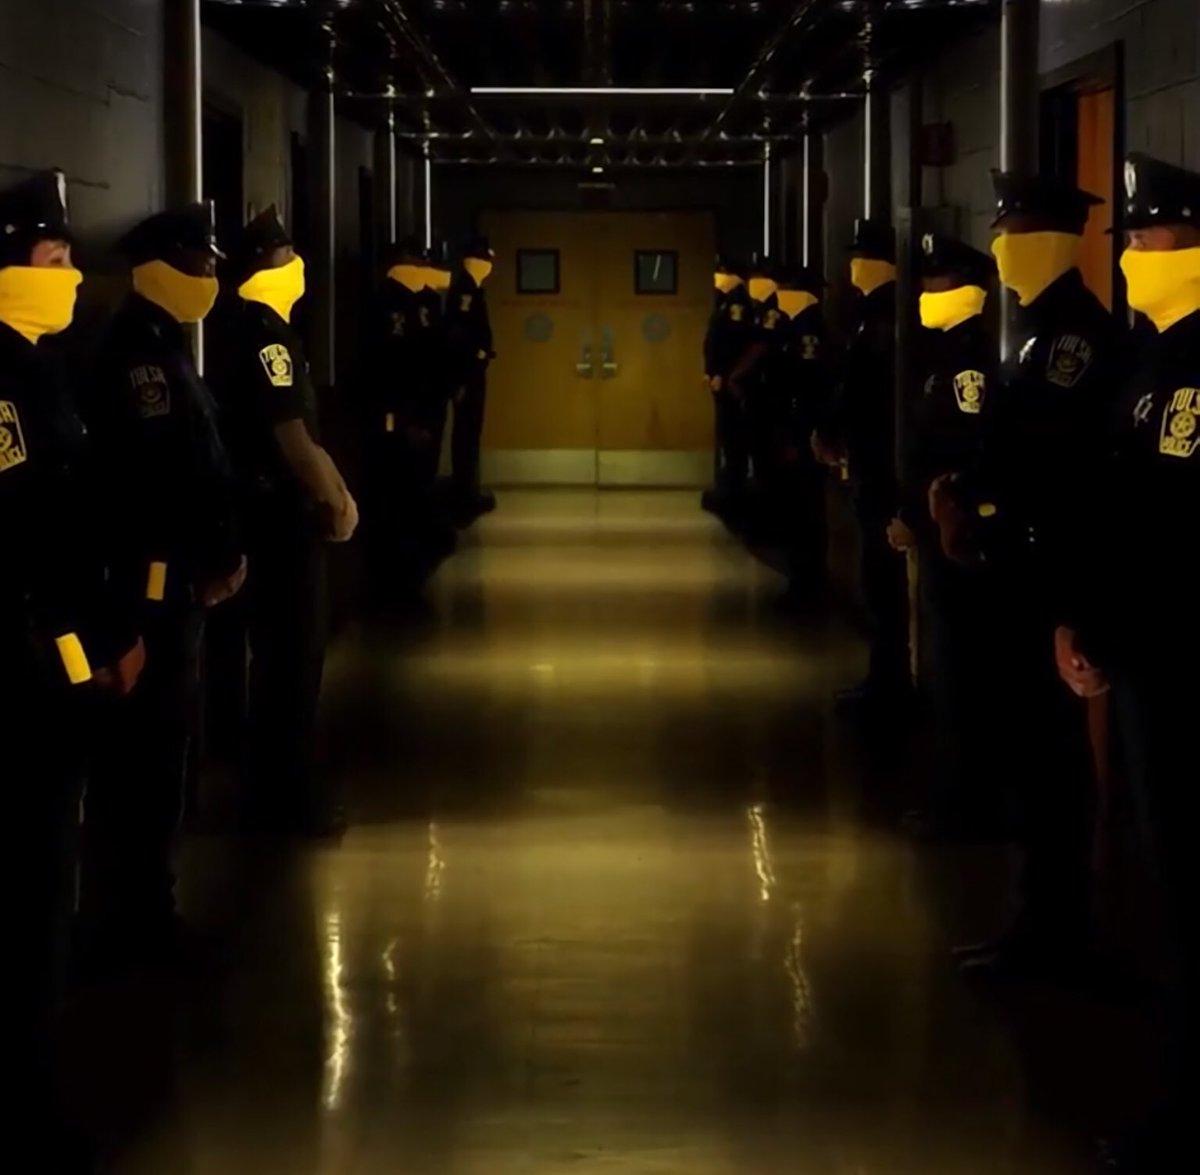 watchmen tv series - HD1200×1175